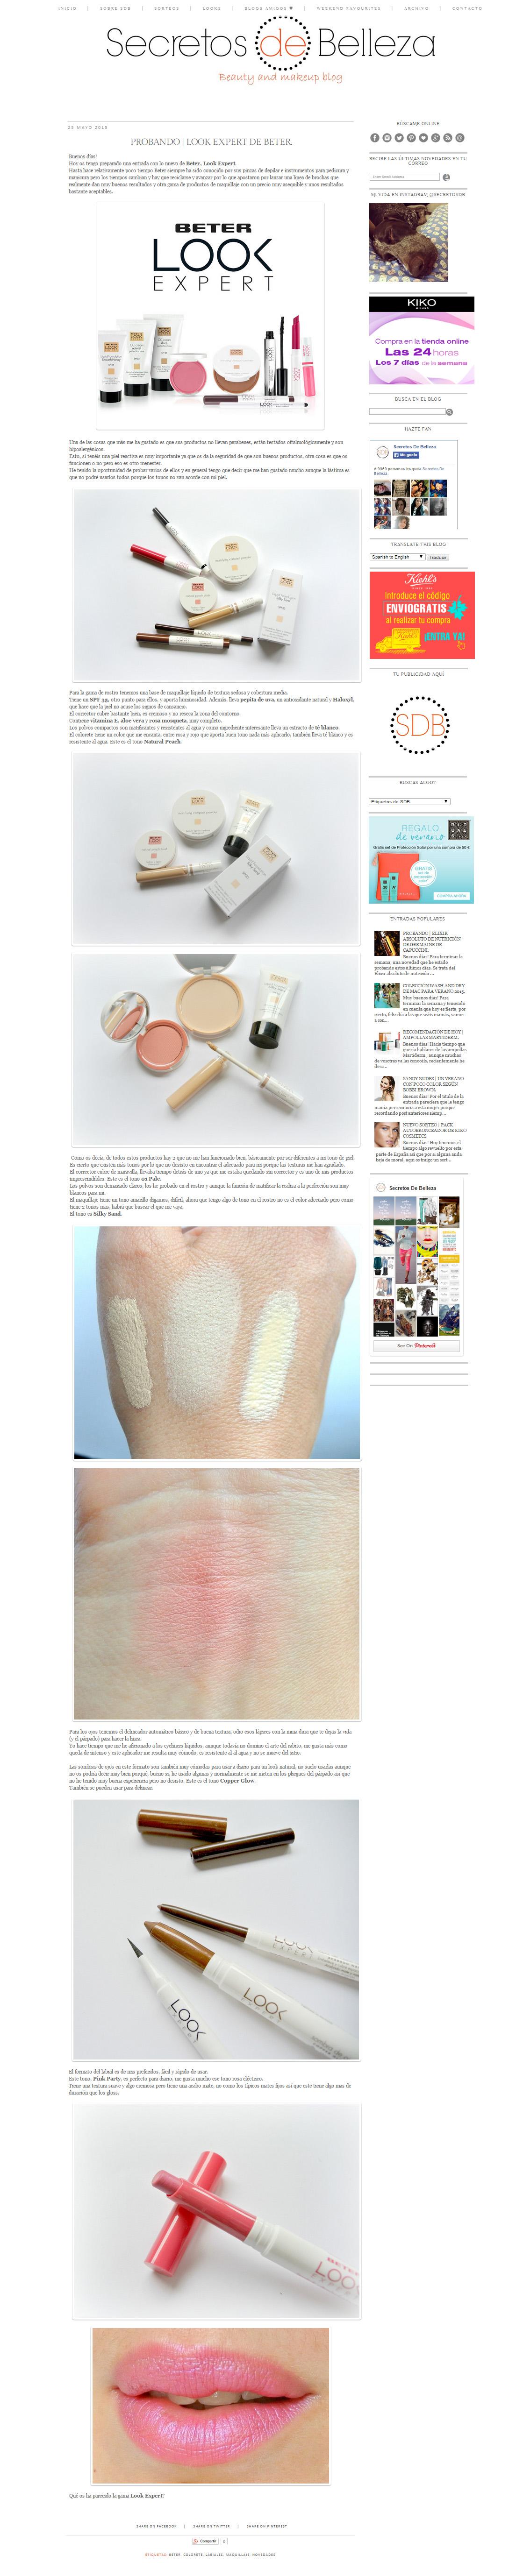 Blog Secretos de Belleza, Mayo 2015. Línea cosmética #LookExpert